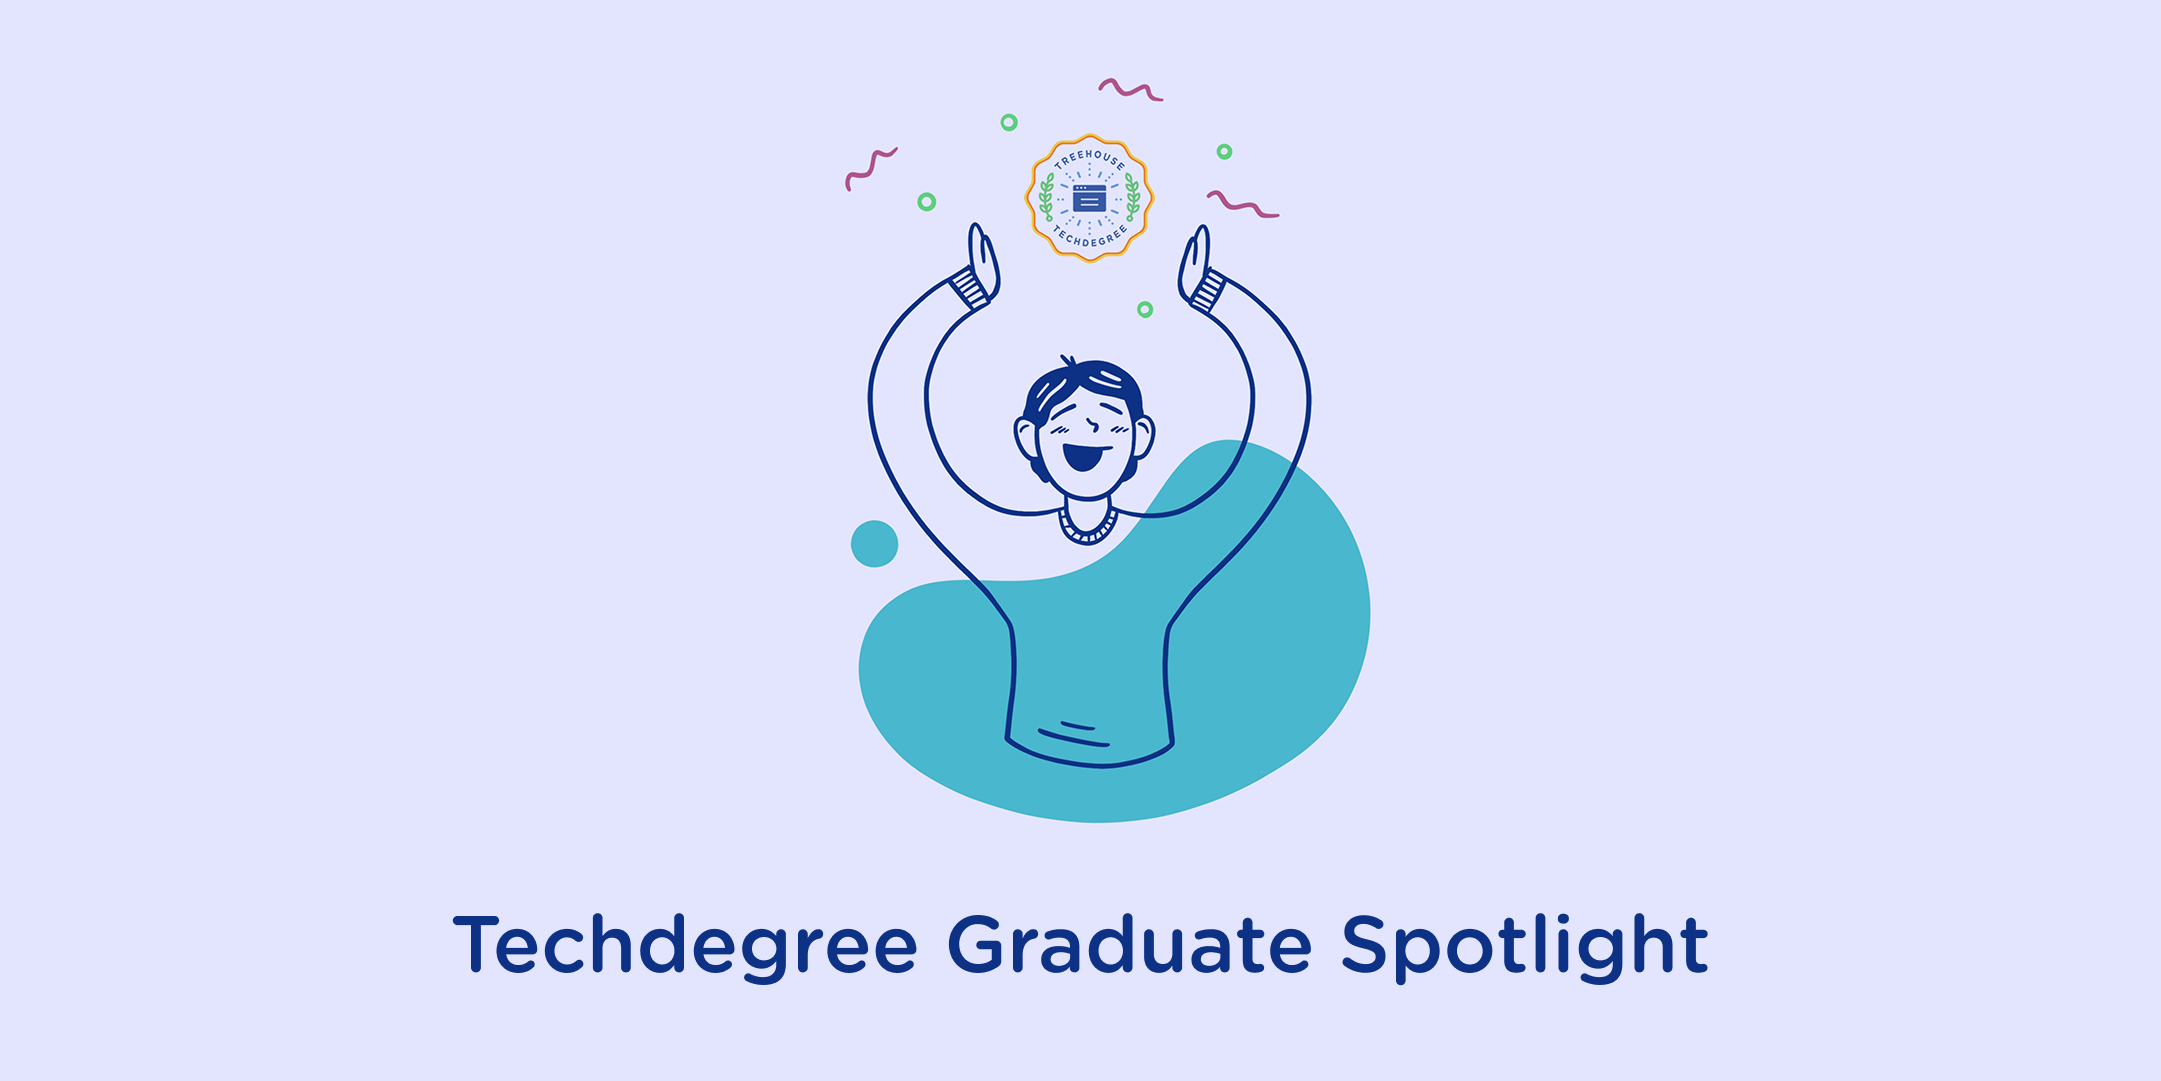 Techdegree Graduate Spotlight